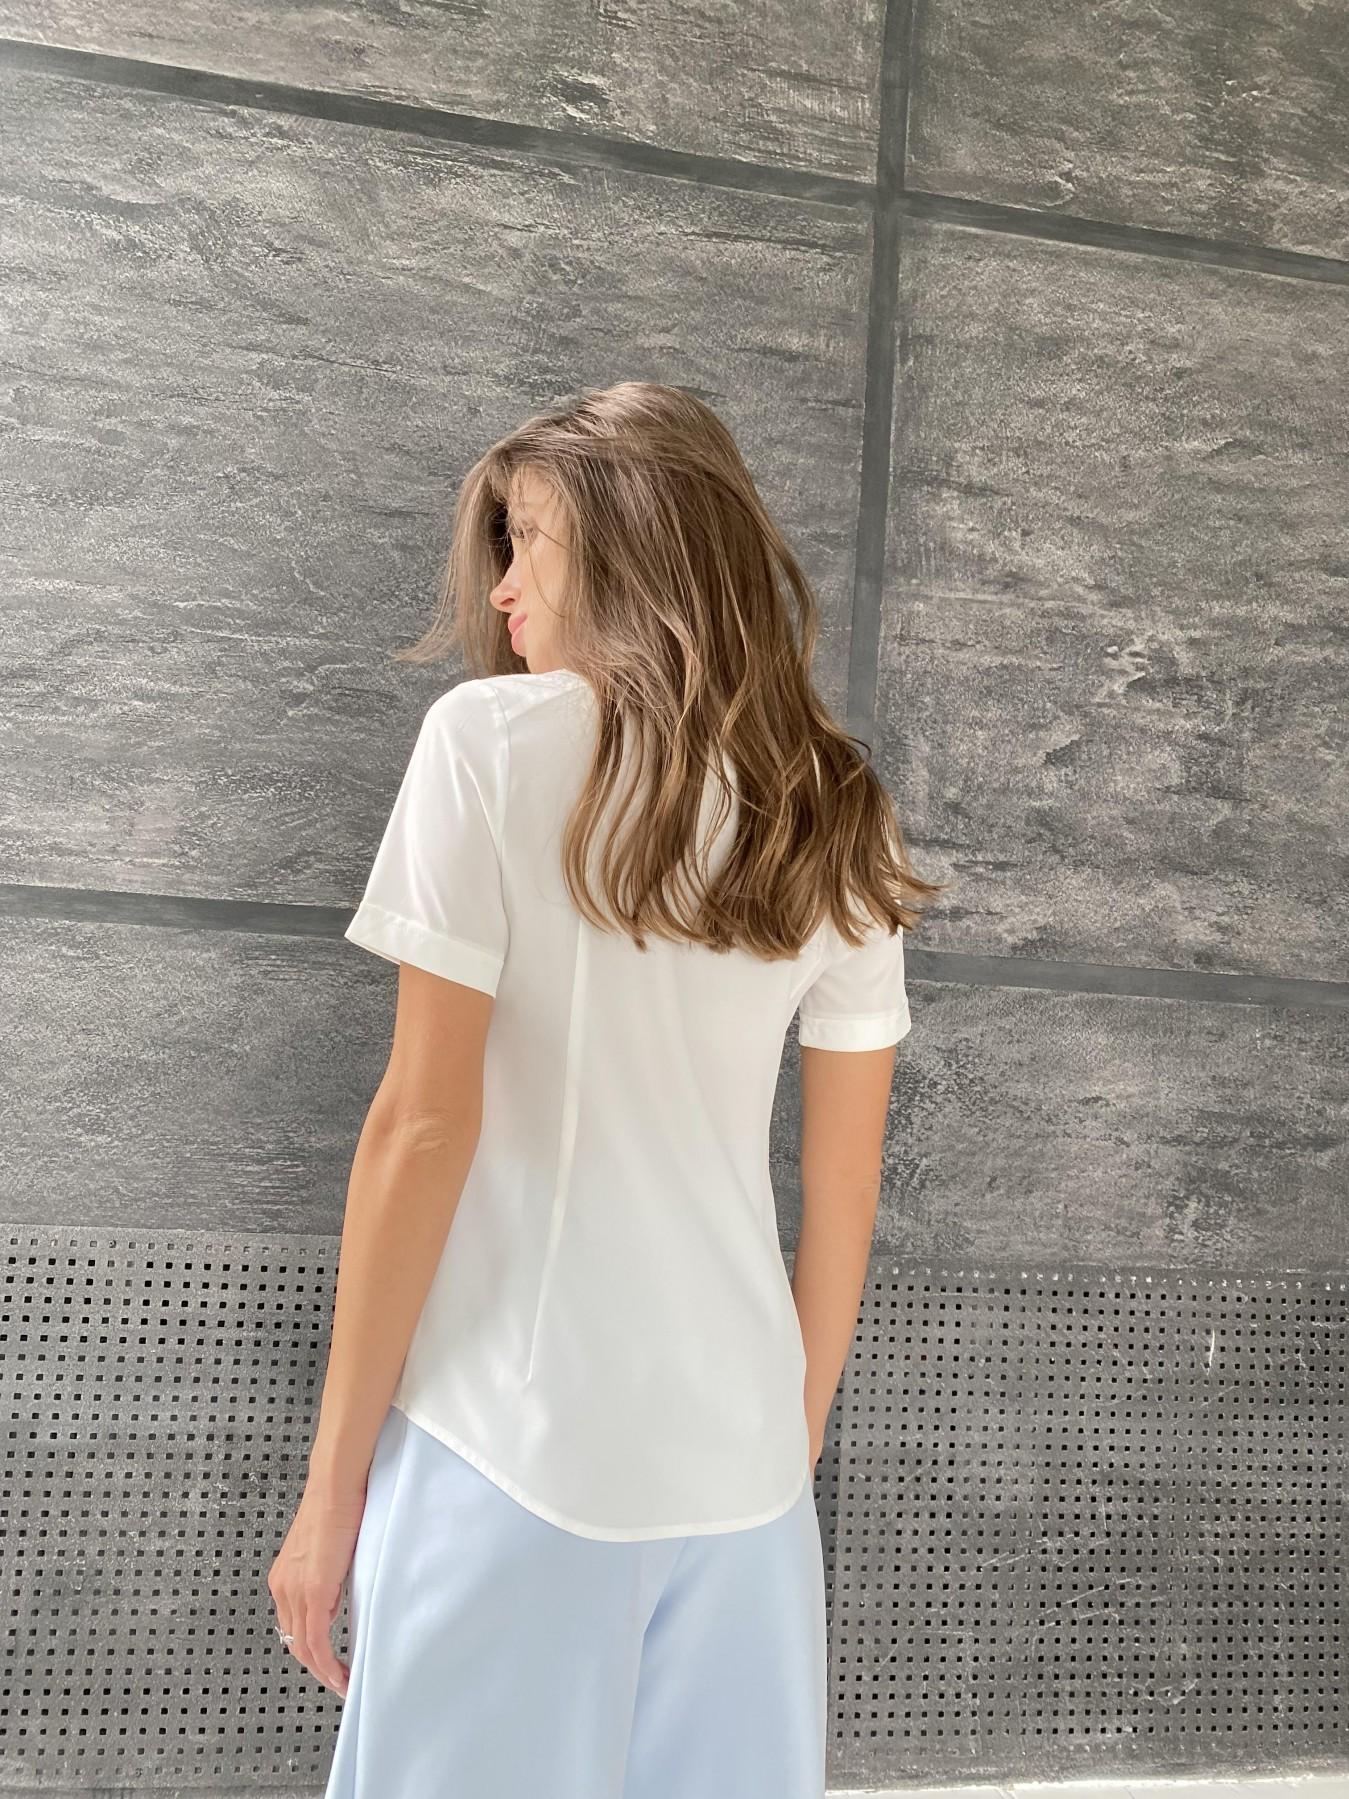 Дженна блуза  софт 11594 АРТ. 48274 Цвет: Белый - фото 2, интернет магазин tm-modus.ru